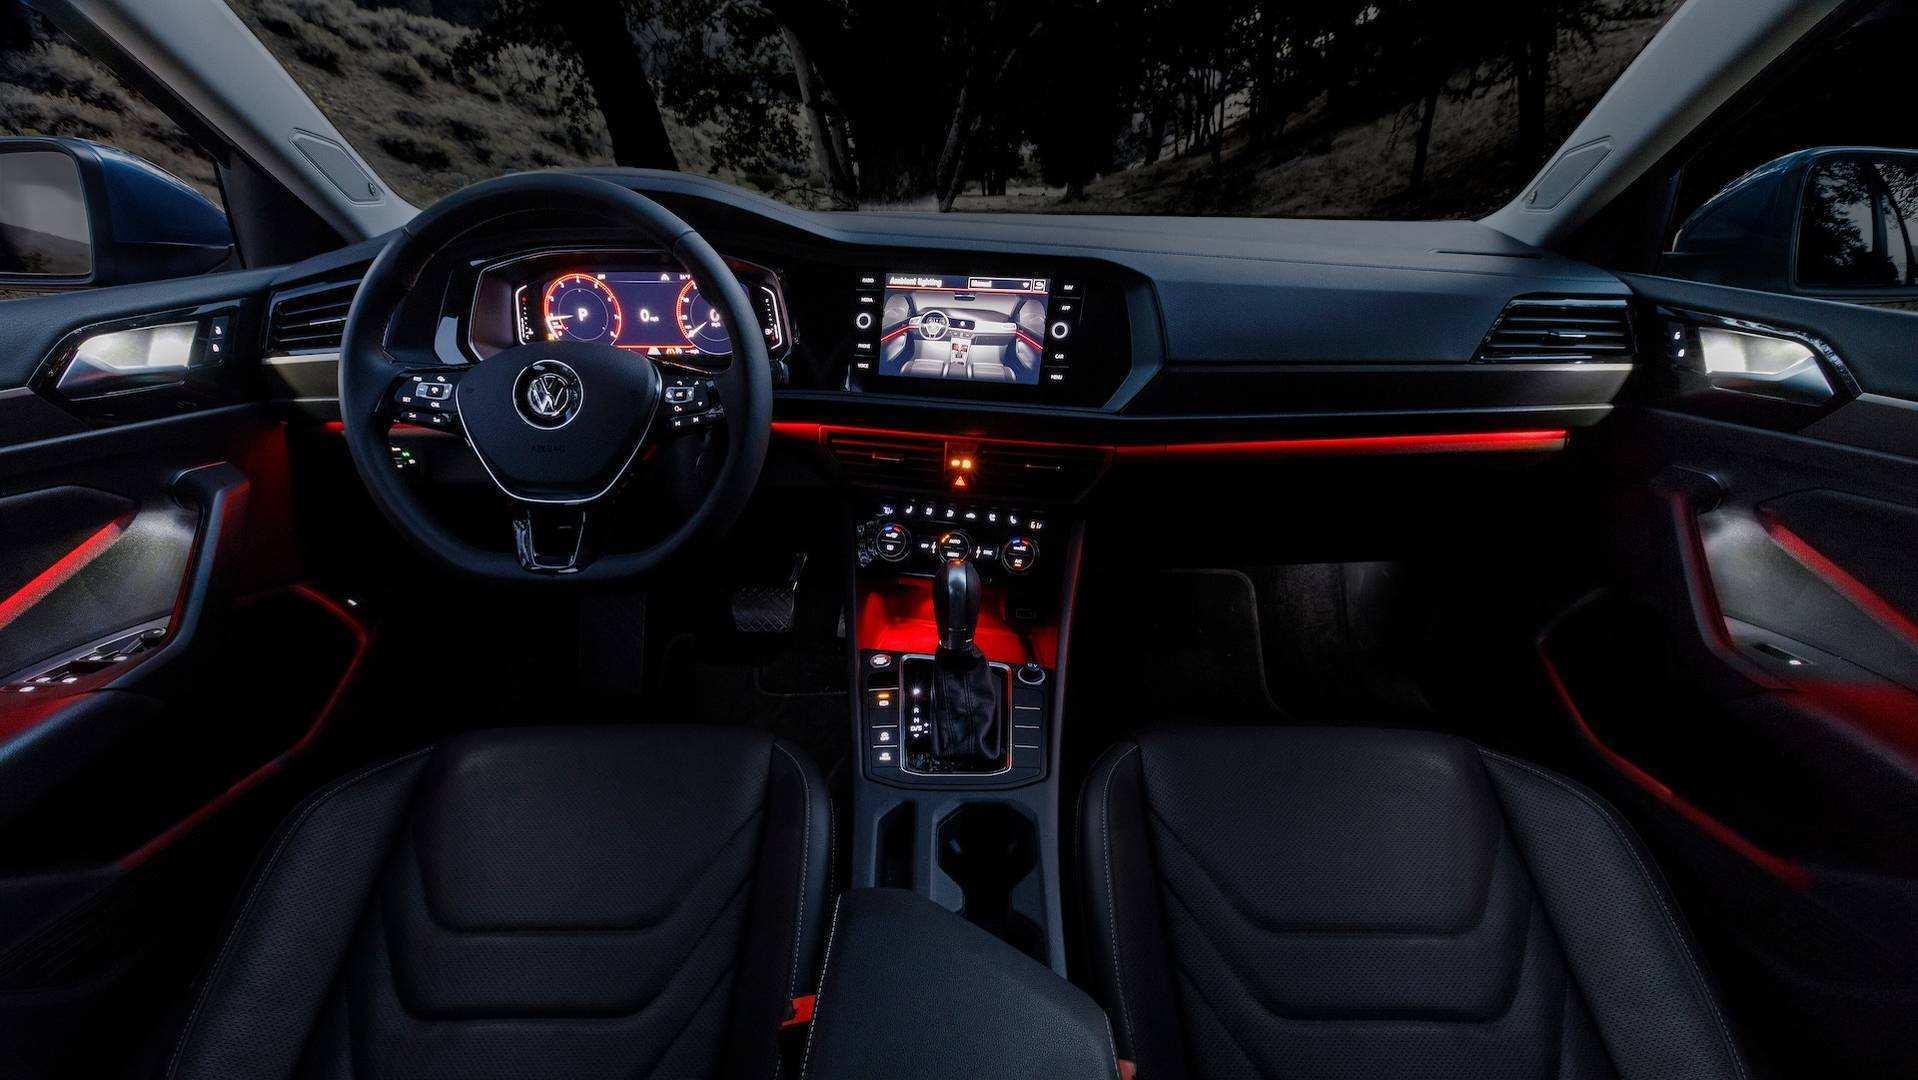 58 All New 2020 Volkswagen Gli Specs and Review for 2020 Volkswagen Gli